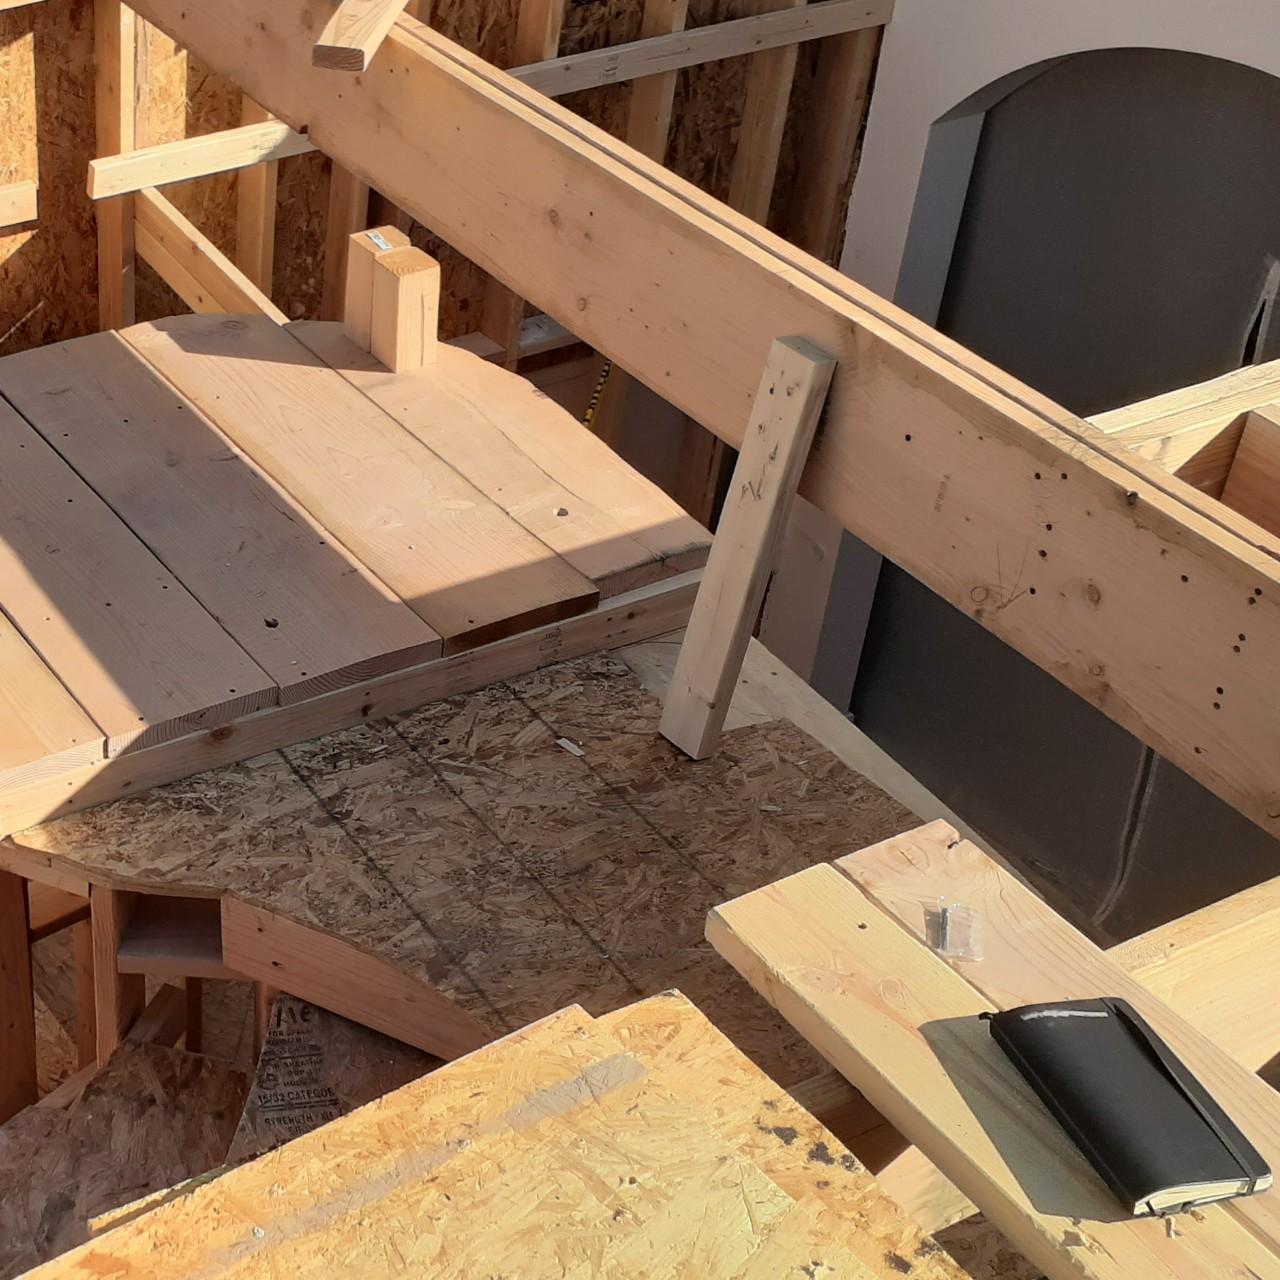 carpentry-wood-framing-second-floor-home-addition--framing-61